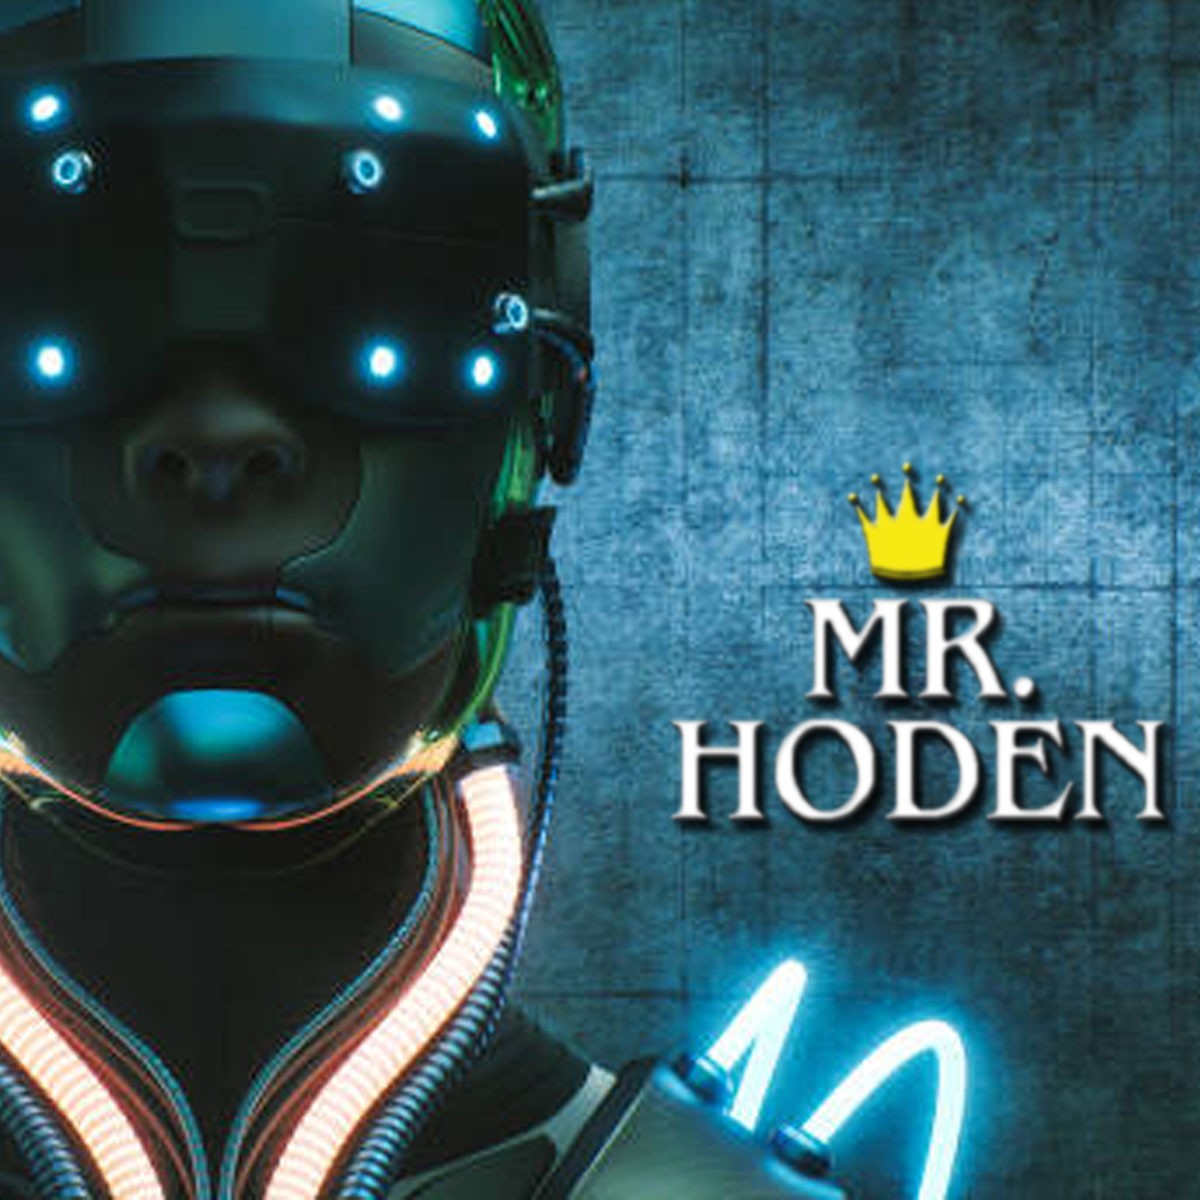 Upcoming: Mr. Hoden - Dark Horror Trap Beat 2019 [FREE BEAT]